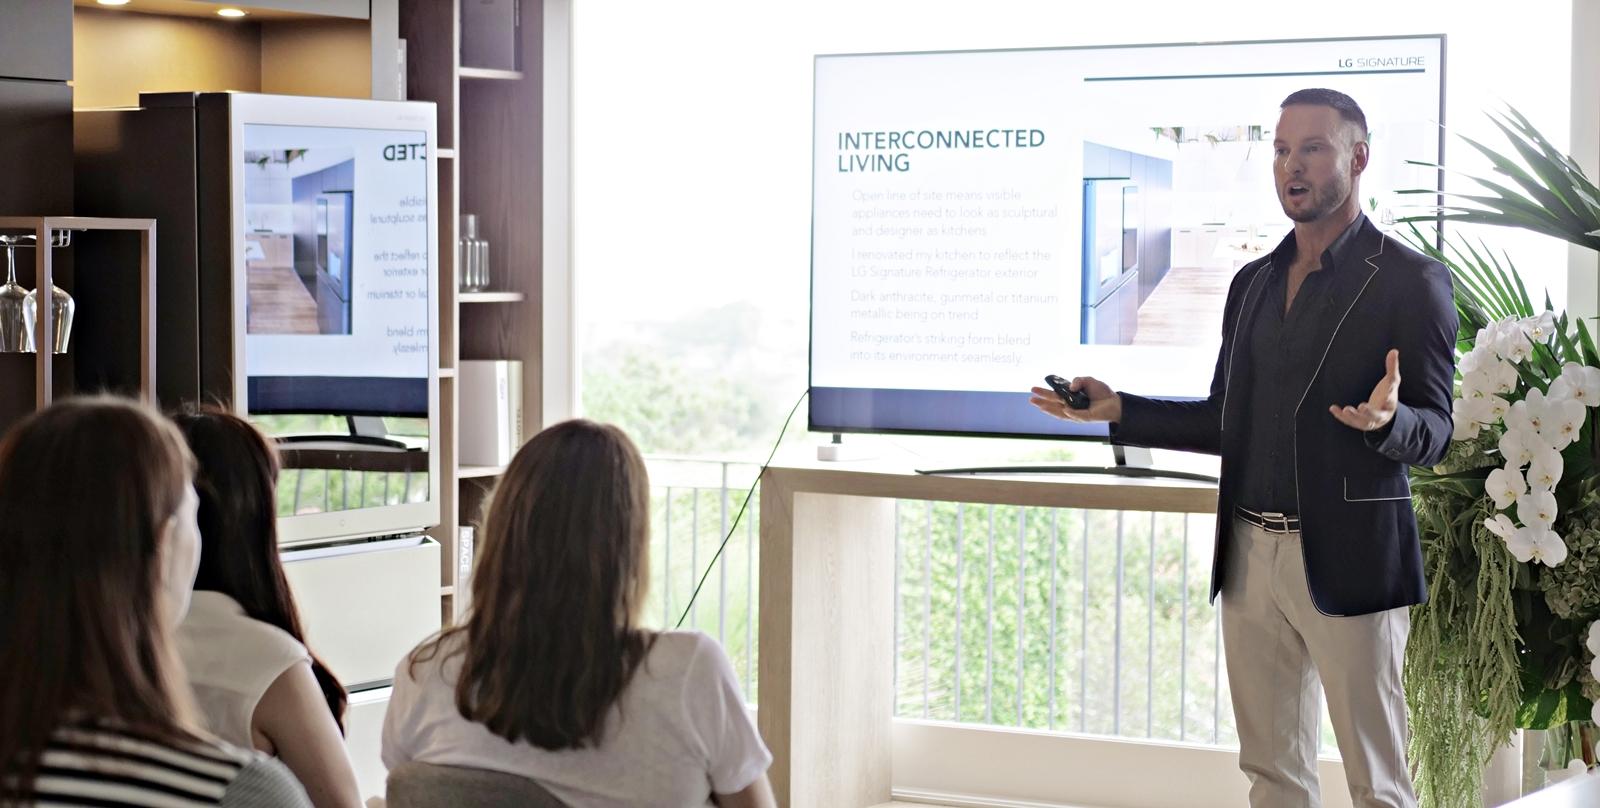 "LG전자가 15일 호주 시드니 근교에 마련한 'LG 홈(LG Home)'에서 호주 출신의 유명 인테리어 디자이너인 다렌 파머(Darren Palmer)가 LG 시그니처 디자인 마스터클래스를 진행했다. 다렌 파머는 강연에서 ▲올해의 인테리어 디자인 트렌드 ▲프리미엄 공간을 완성하는 LG 시그니처 ▲인테리어와 가전제품의 조화 등에 대해 소개했고 LG 시그니처에 대해 ""최고의 기술과 디자인을 적용해 고객의 일상을 업그레이드한다""며 ""흠잡을 데 없는 혁신적인 제품""이라고 평가했다."